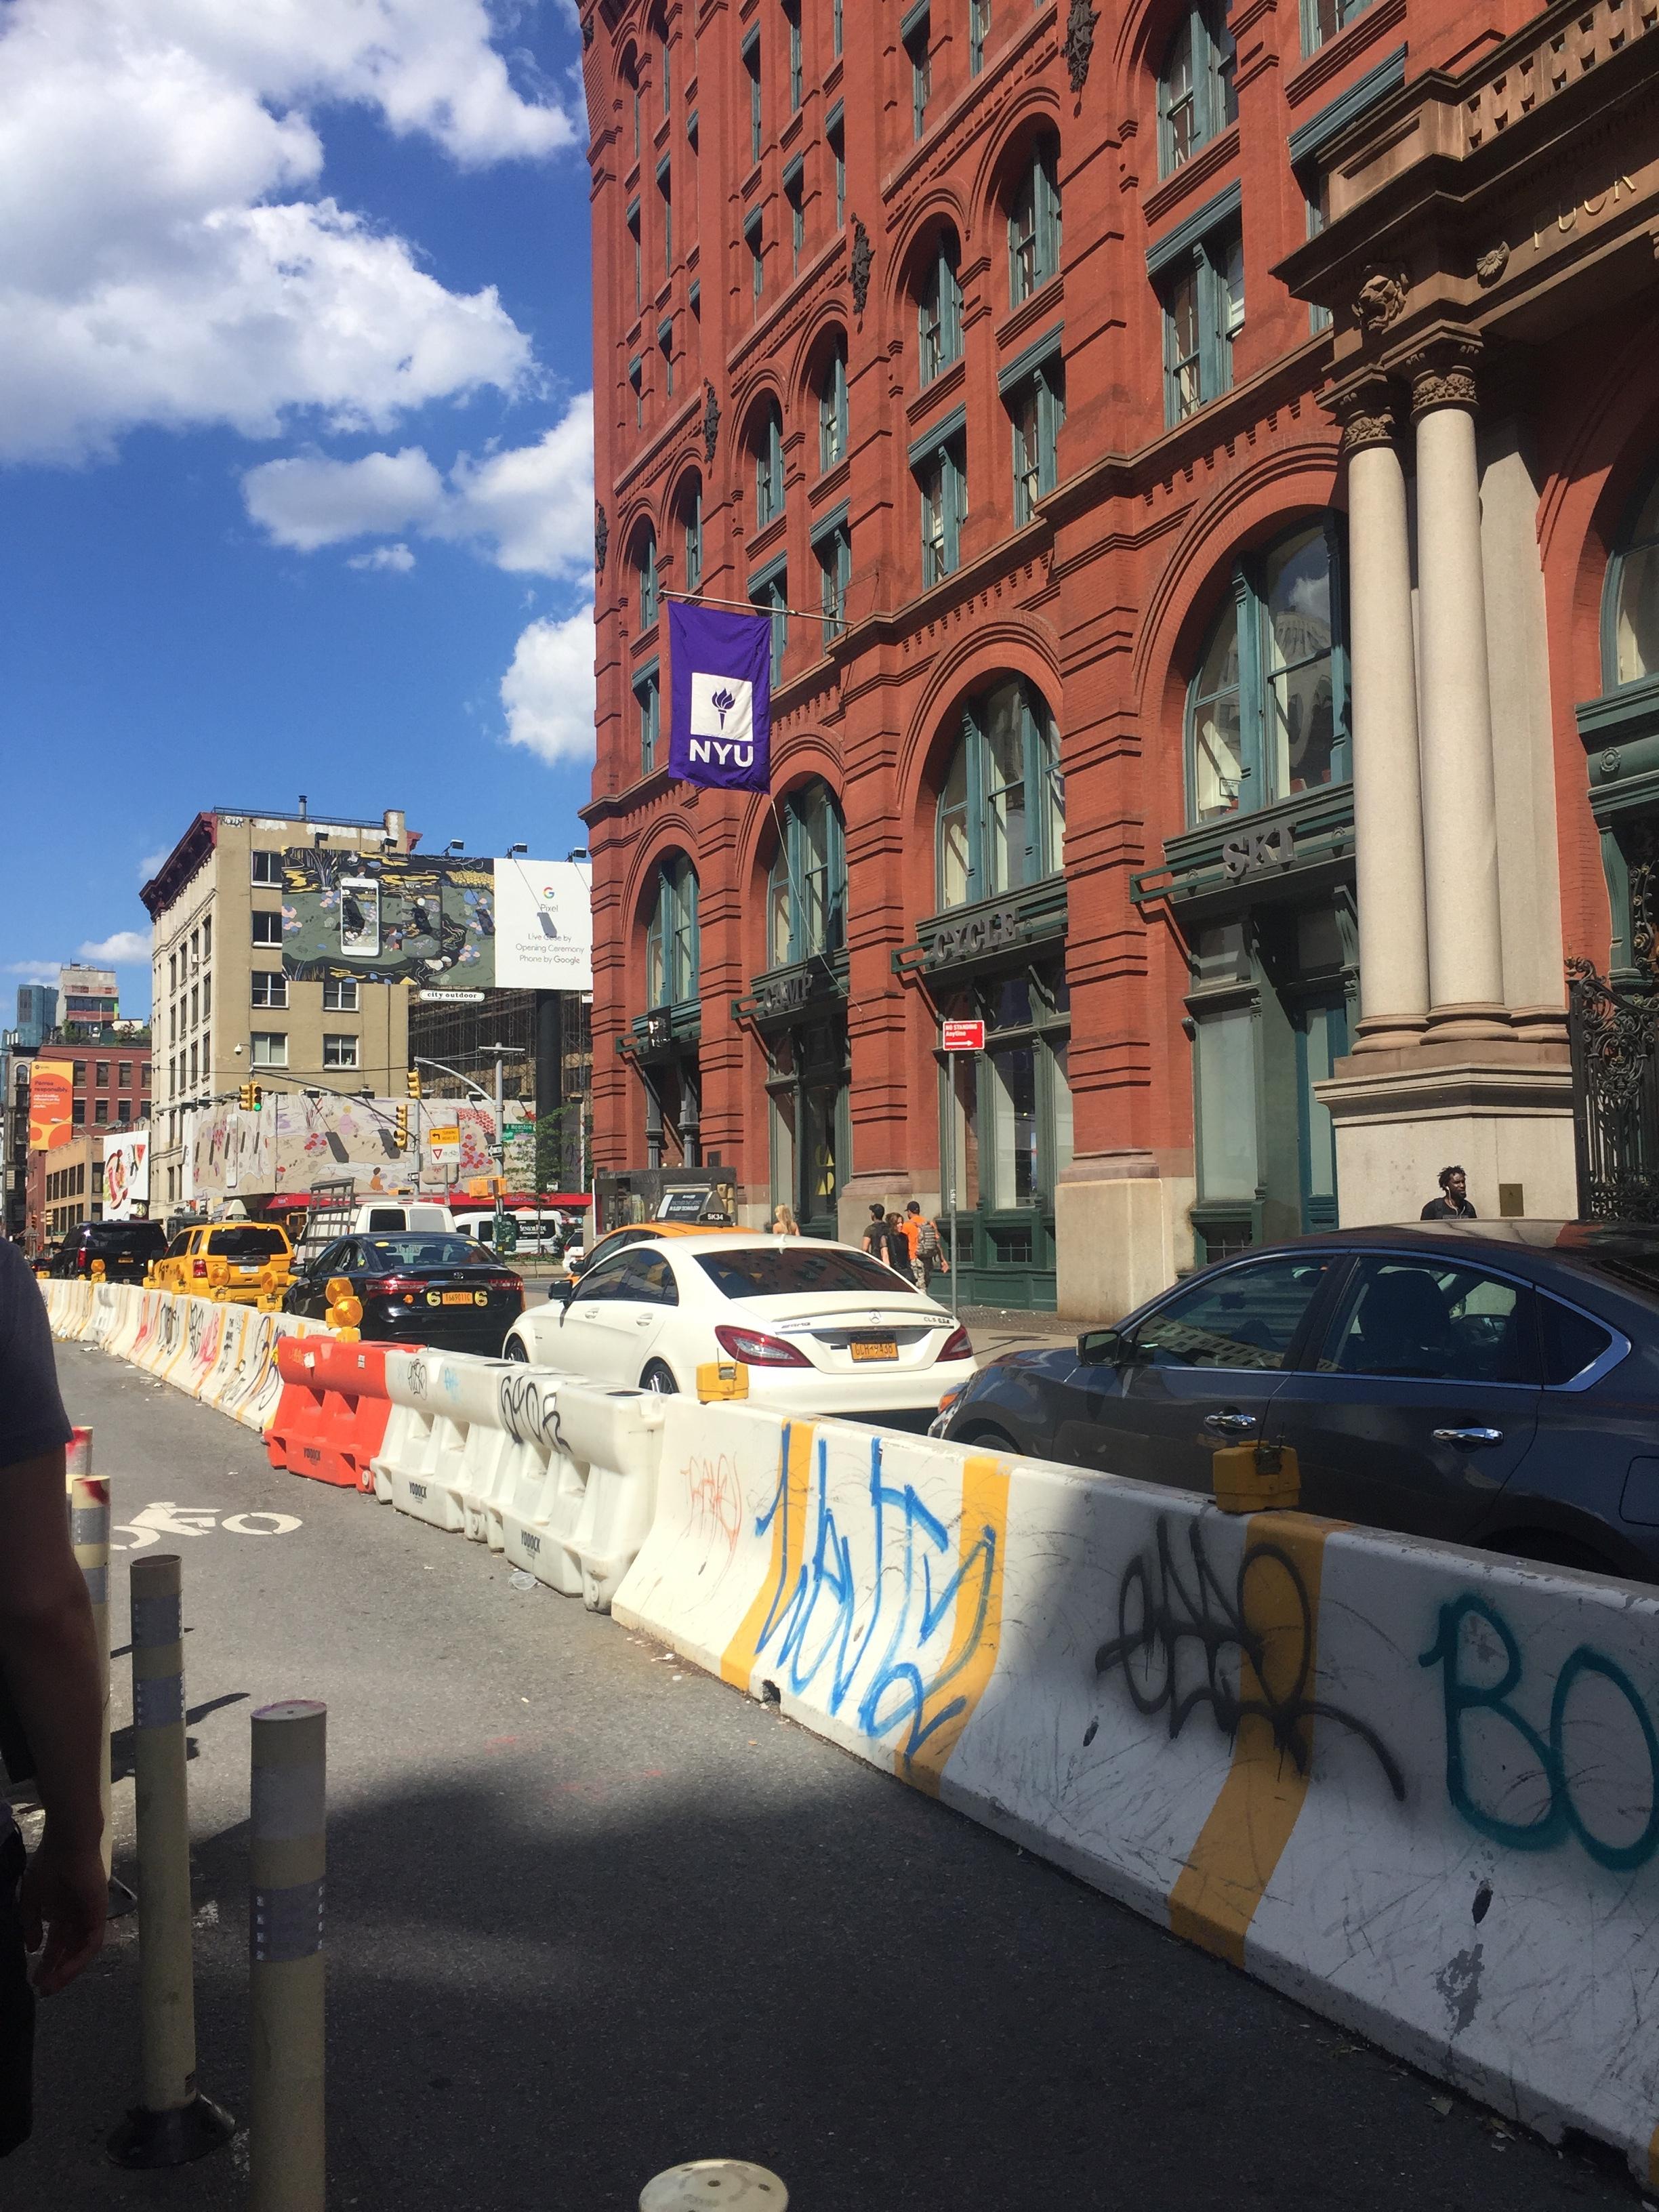 Street view of SoHo